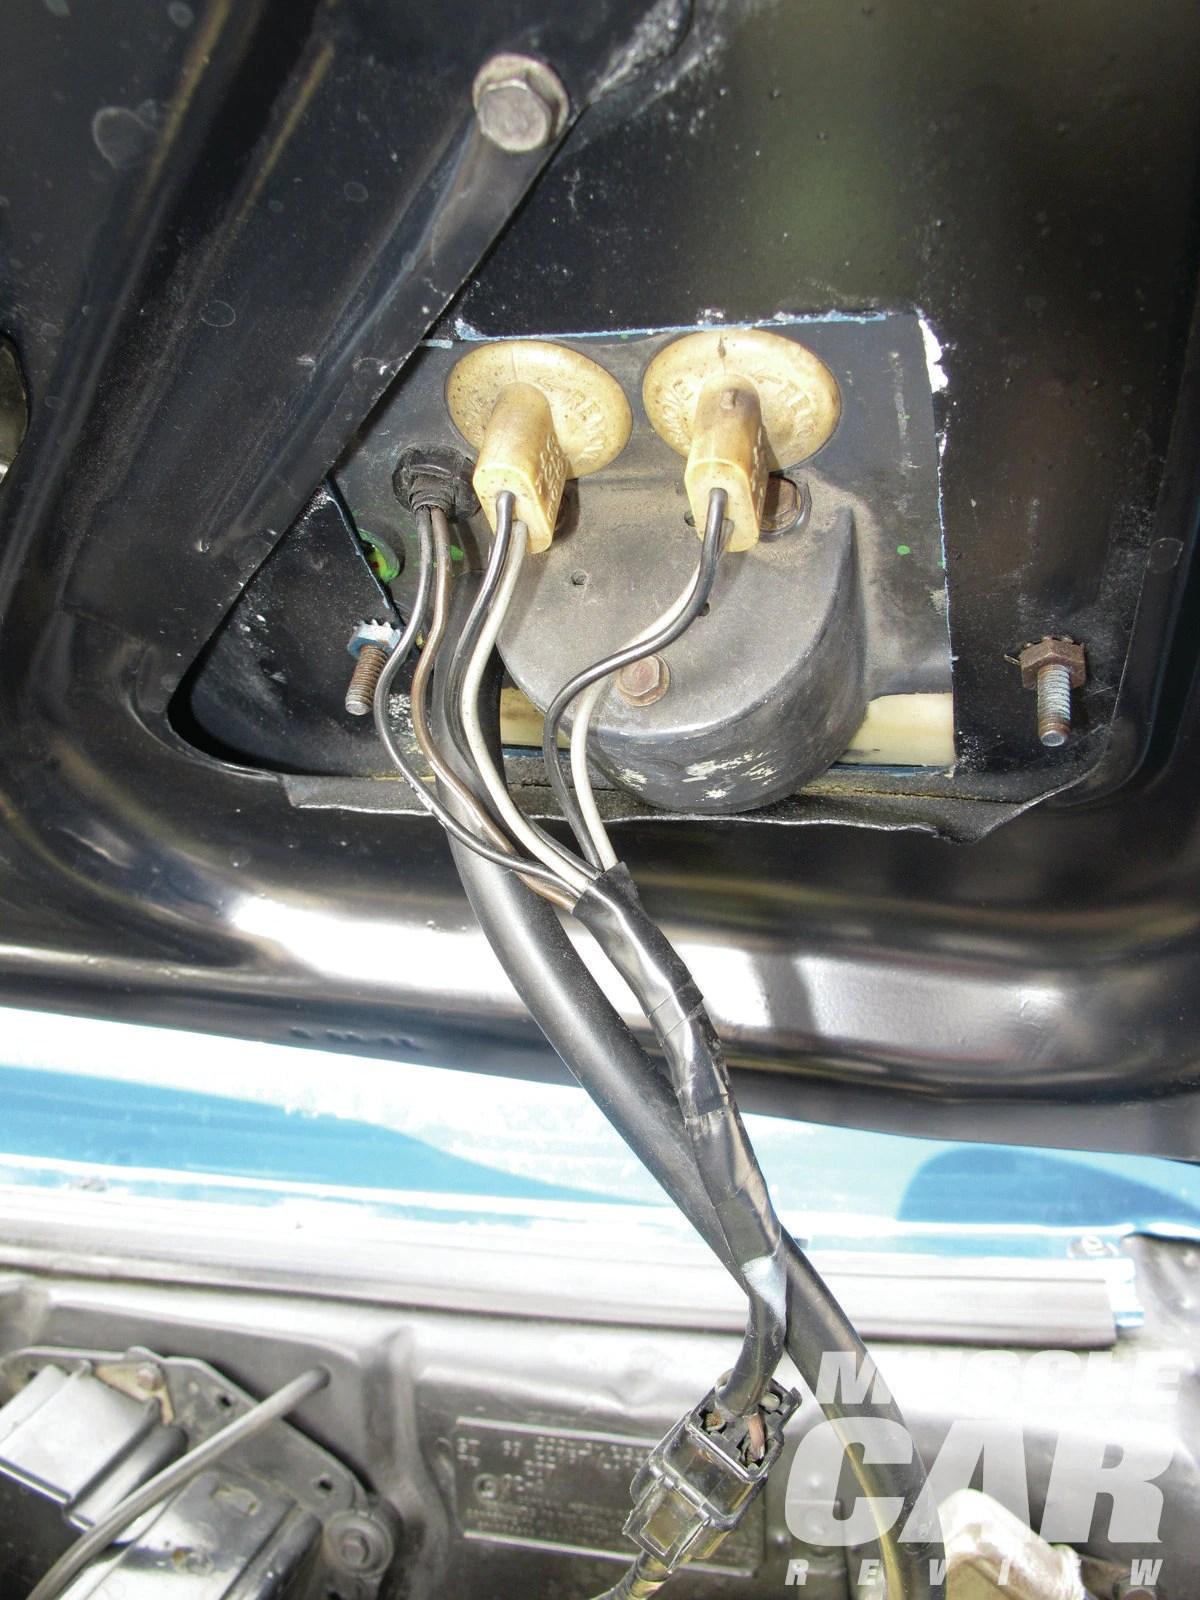 1969 gto hood tach wiring wiring diagrams 68 gto dash wiring diagram 1967 gto hood tachometer wiring diagram [ 1200 x 1600 Pixel ]